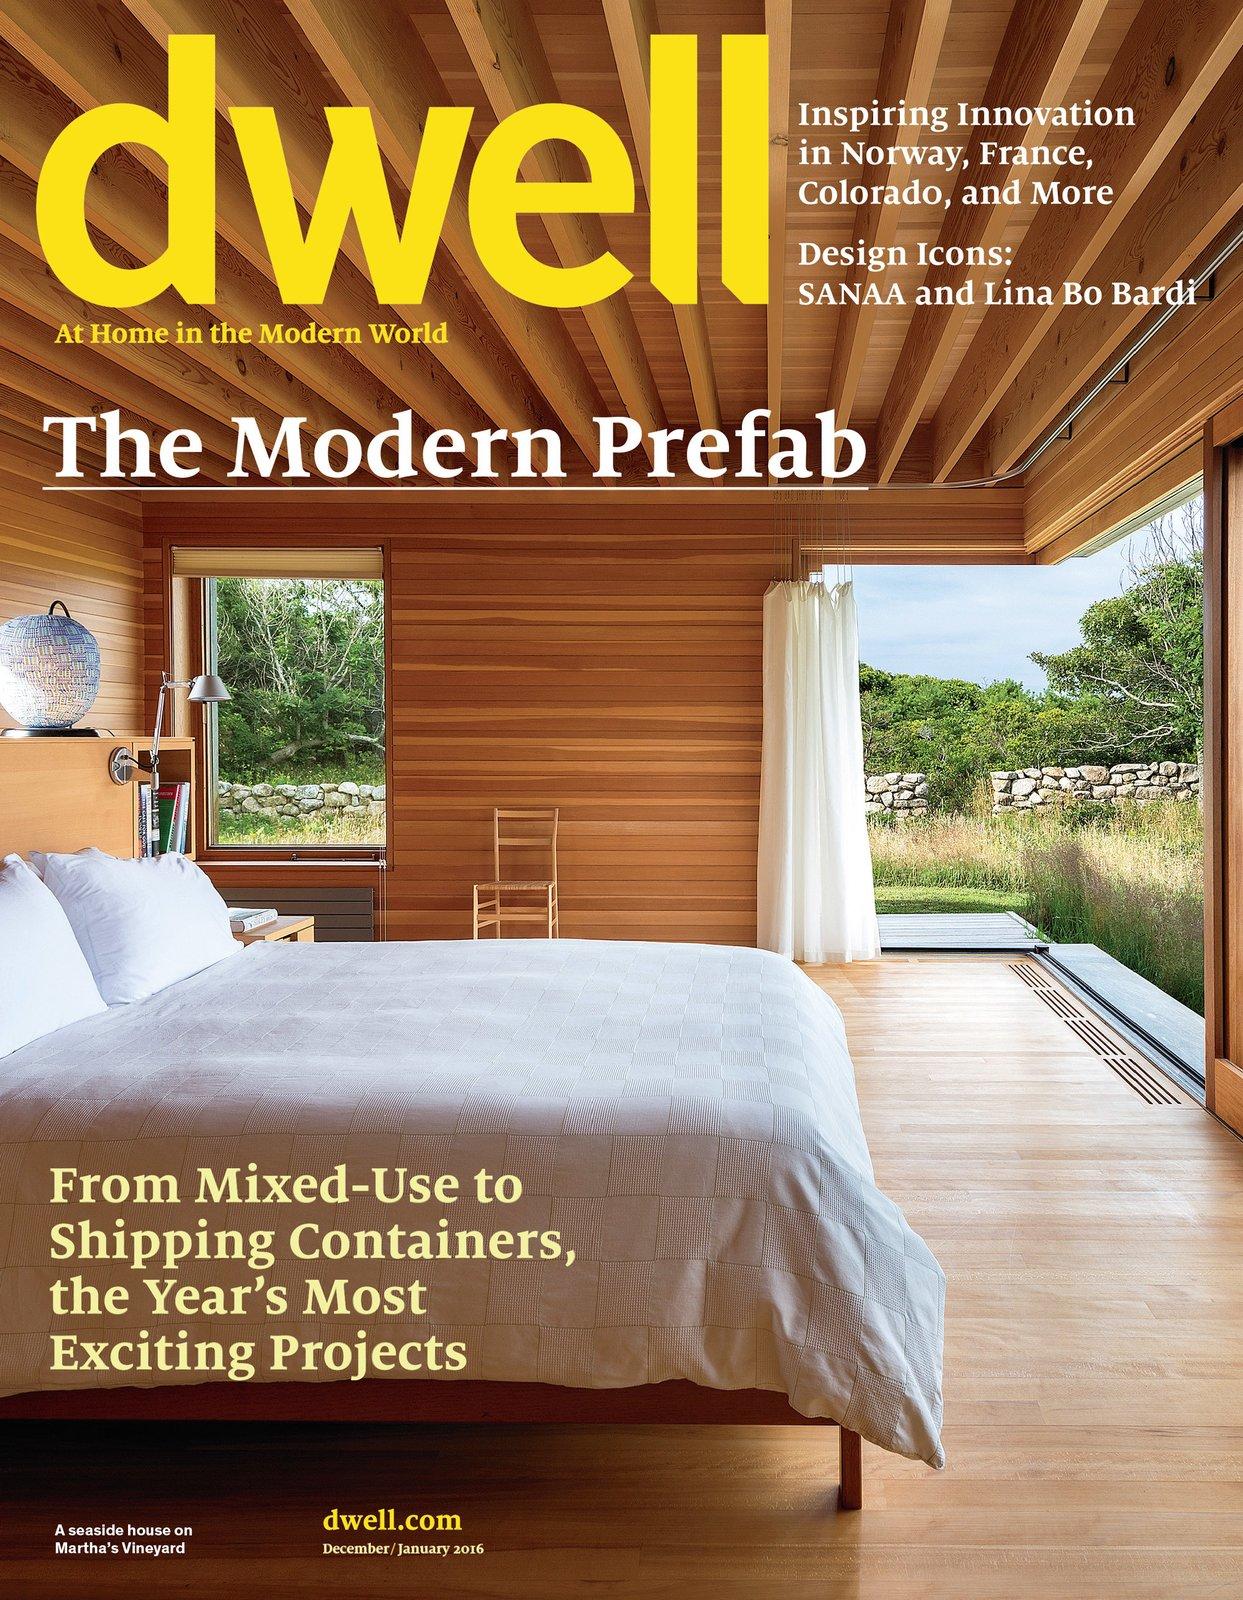 Dwell December/January 2016, Vol. 16 Issue 01: The Modern Prefab by Dwell